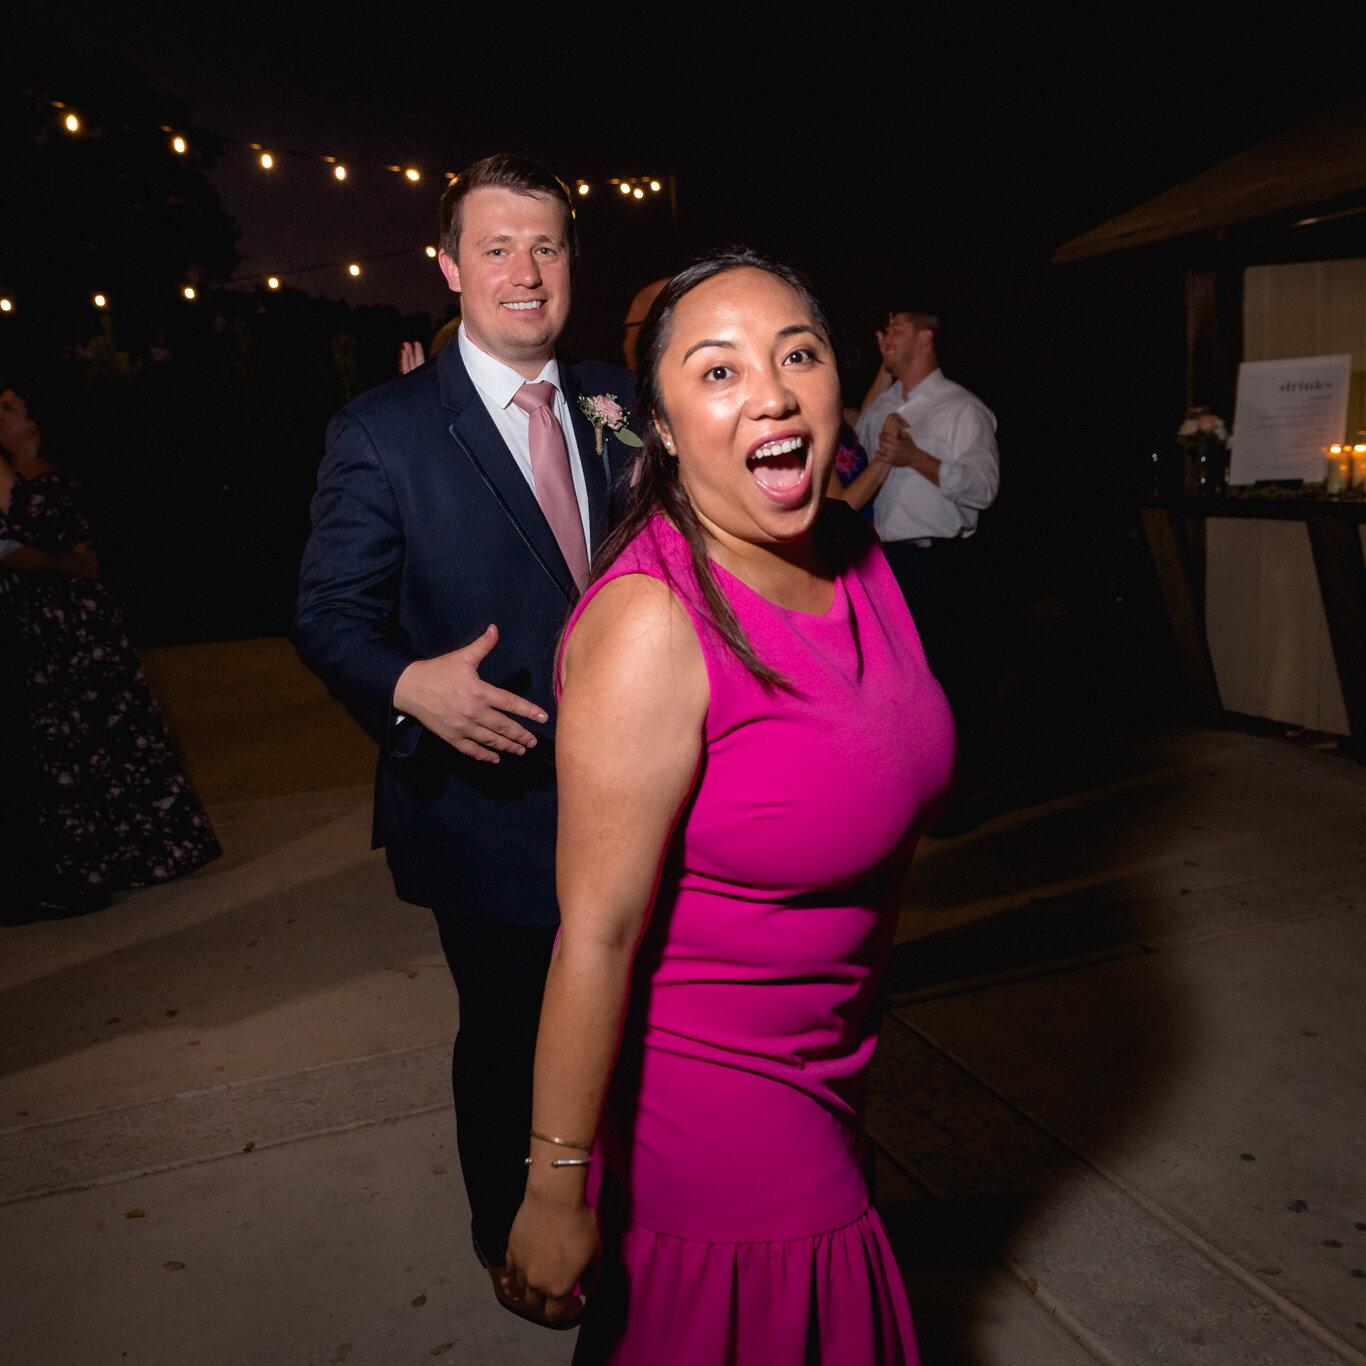 2019.08.24_Emily-Ashir-Wedding-at-the-Maples-6415.jpg